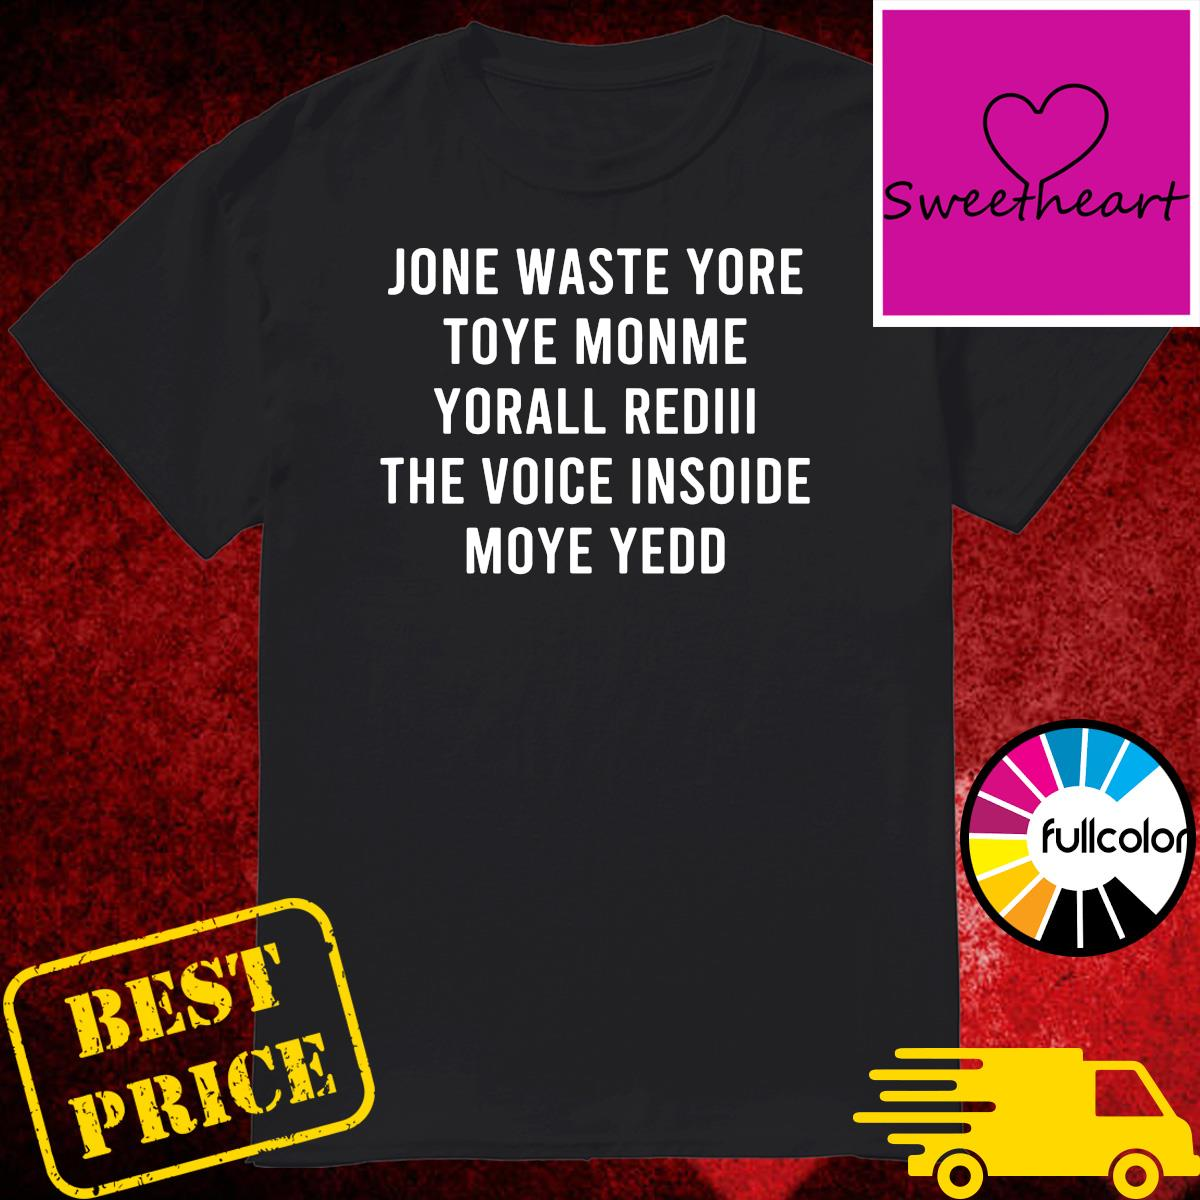 Official Jone Waste Yore Toye Monme Yorall Rediii Shirt